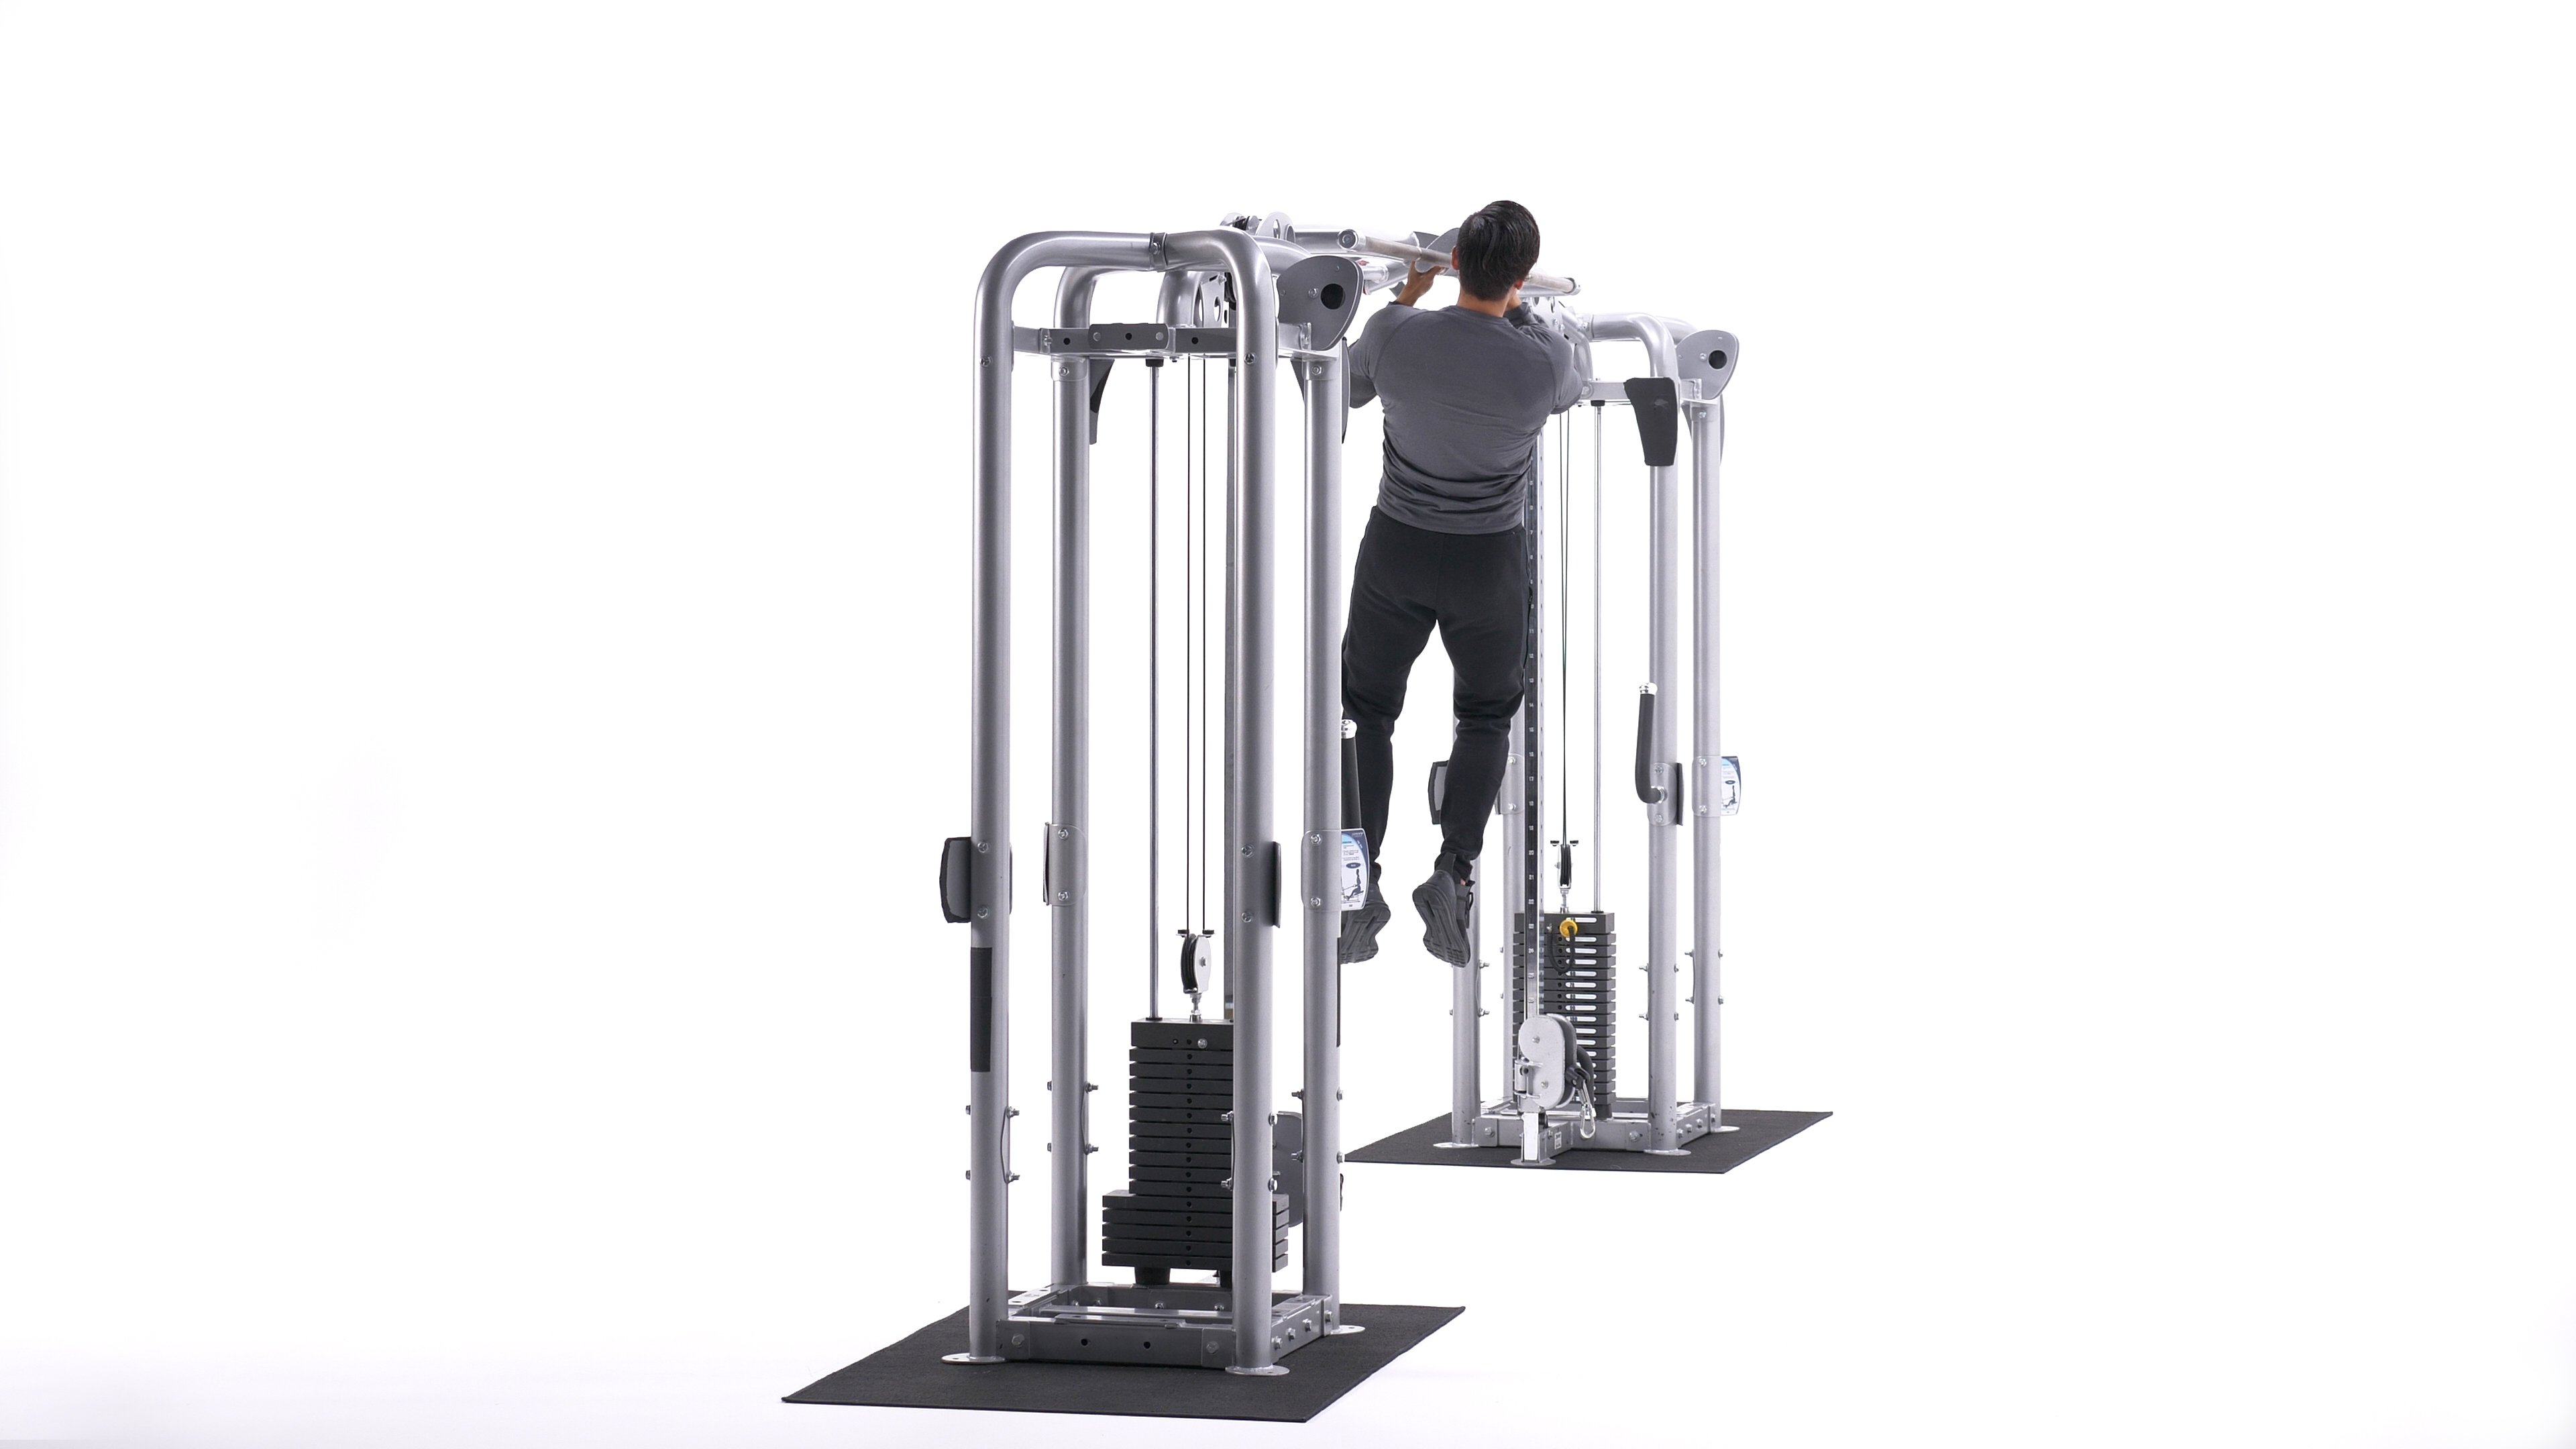 V-bar pull-up image